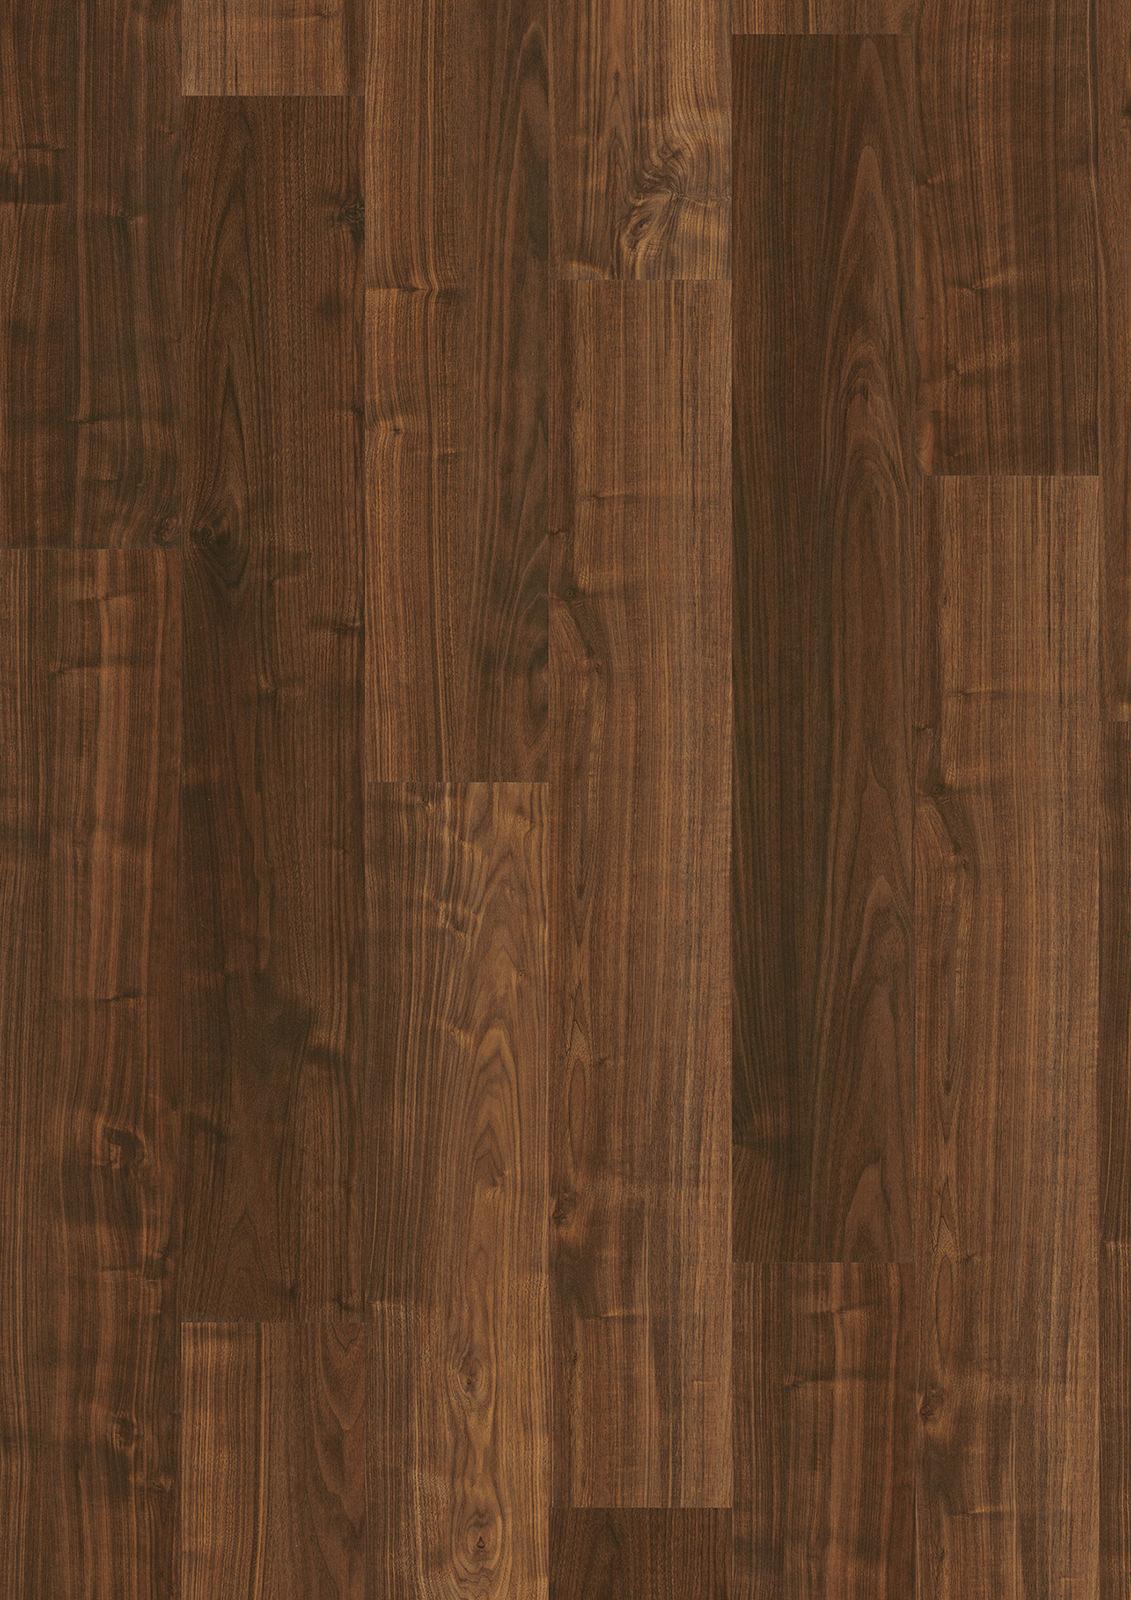 parador basic 200 1285x194x7 mm walnuss 1426419 franke raumwert. Black Bedroom Furniture Sets. Home Design Ideas